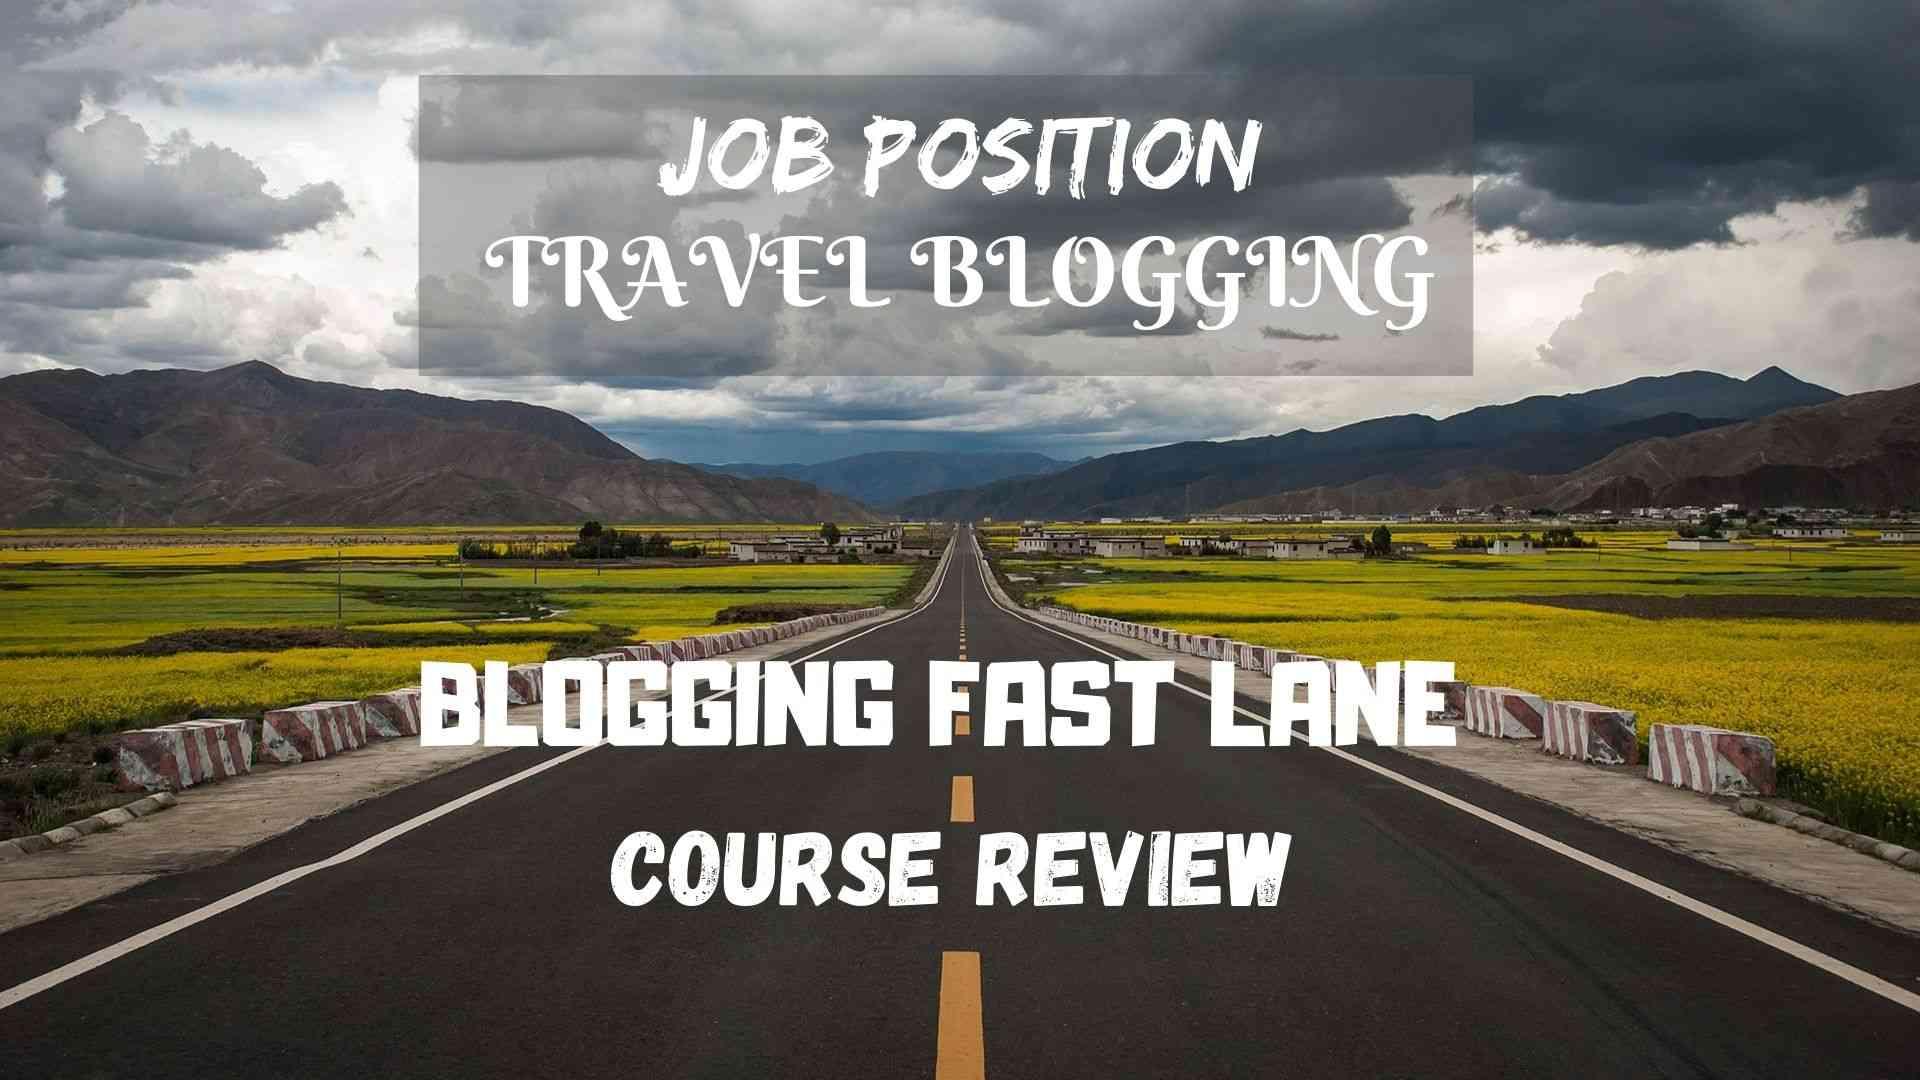 JOB POSITION: TRAVEL BLOGGING- Blogging Fast Lane course review